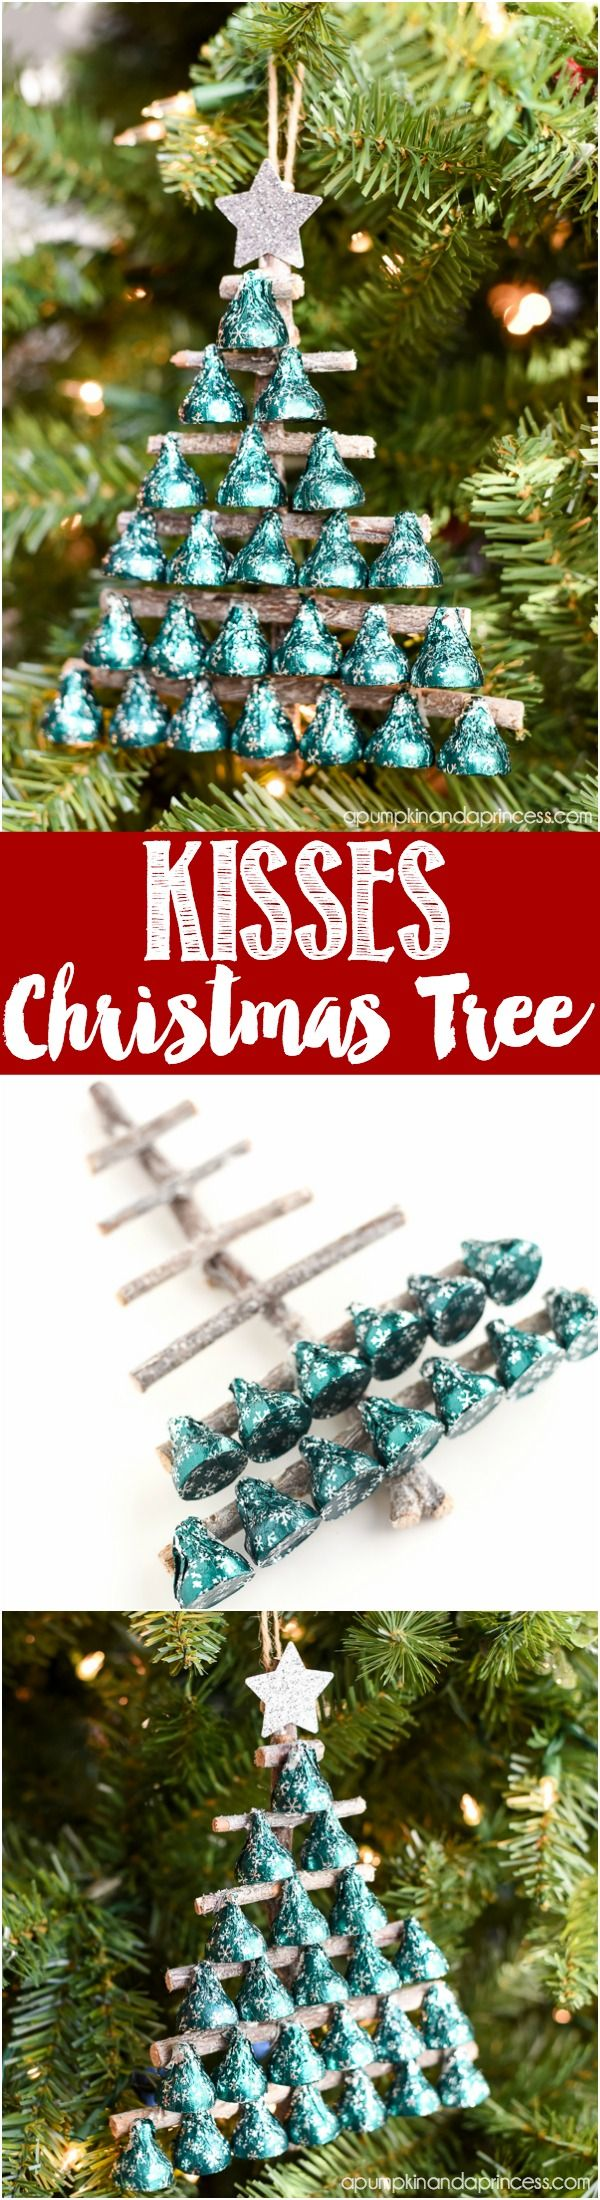 DIY KISSES Candy Christmas Tree - cute neighbor gift or teacher gift idea kids can make.